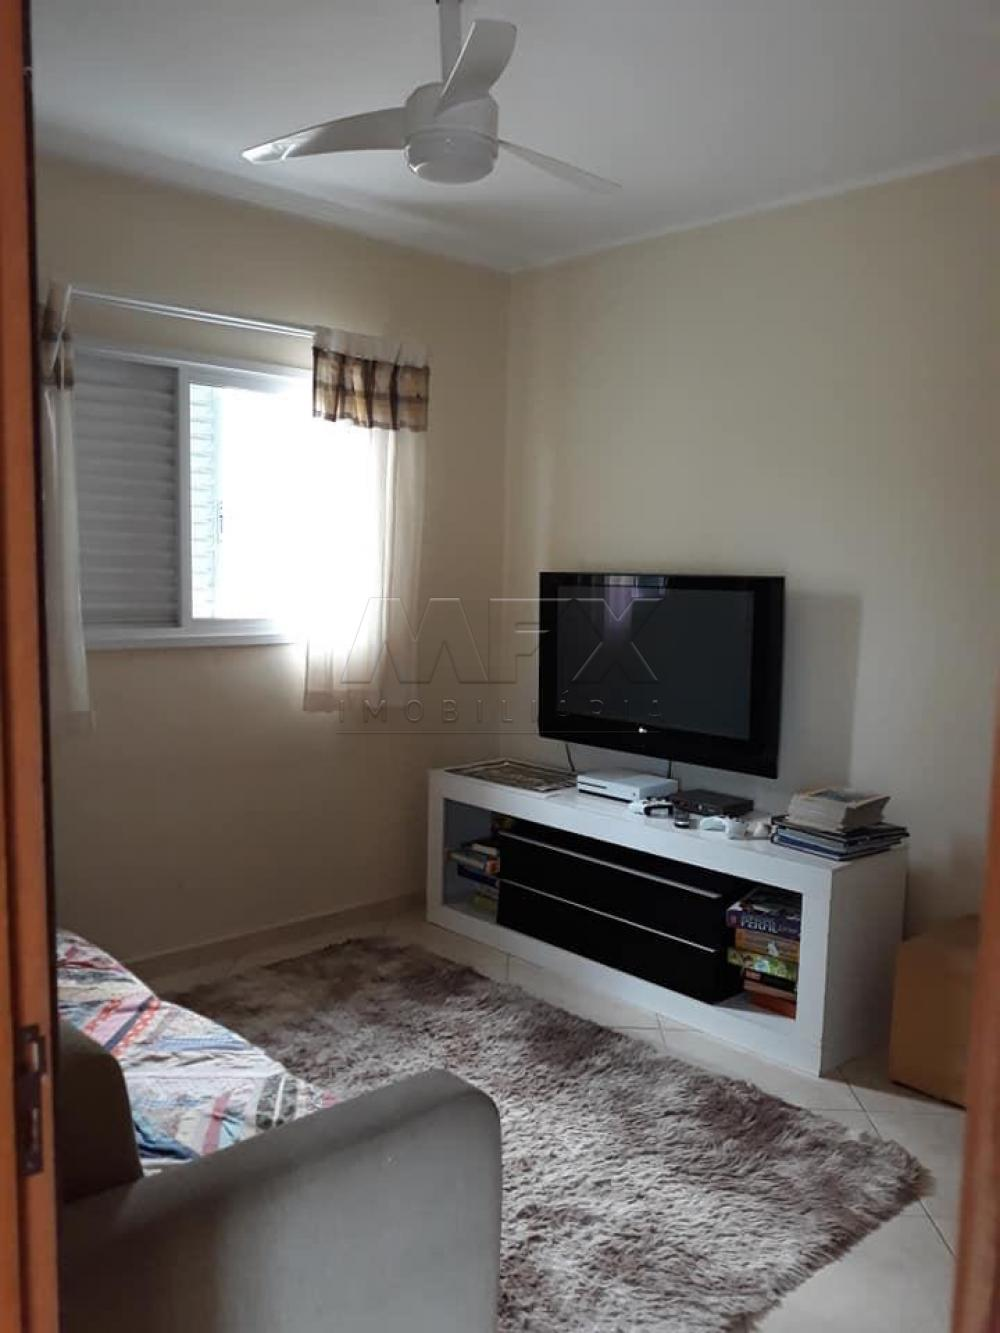 Comprar Casa / Condomínio em Bauru apenas R$ 750.000,00 - Foto 7